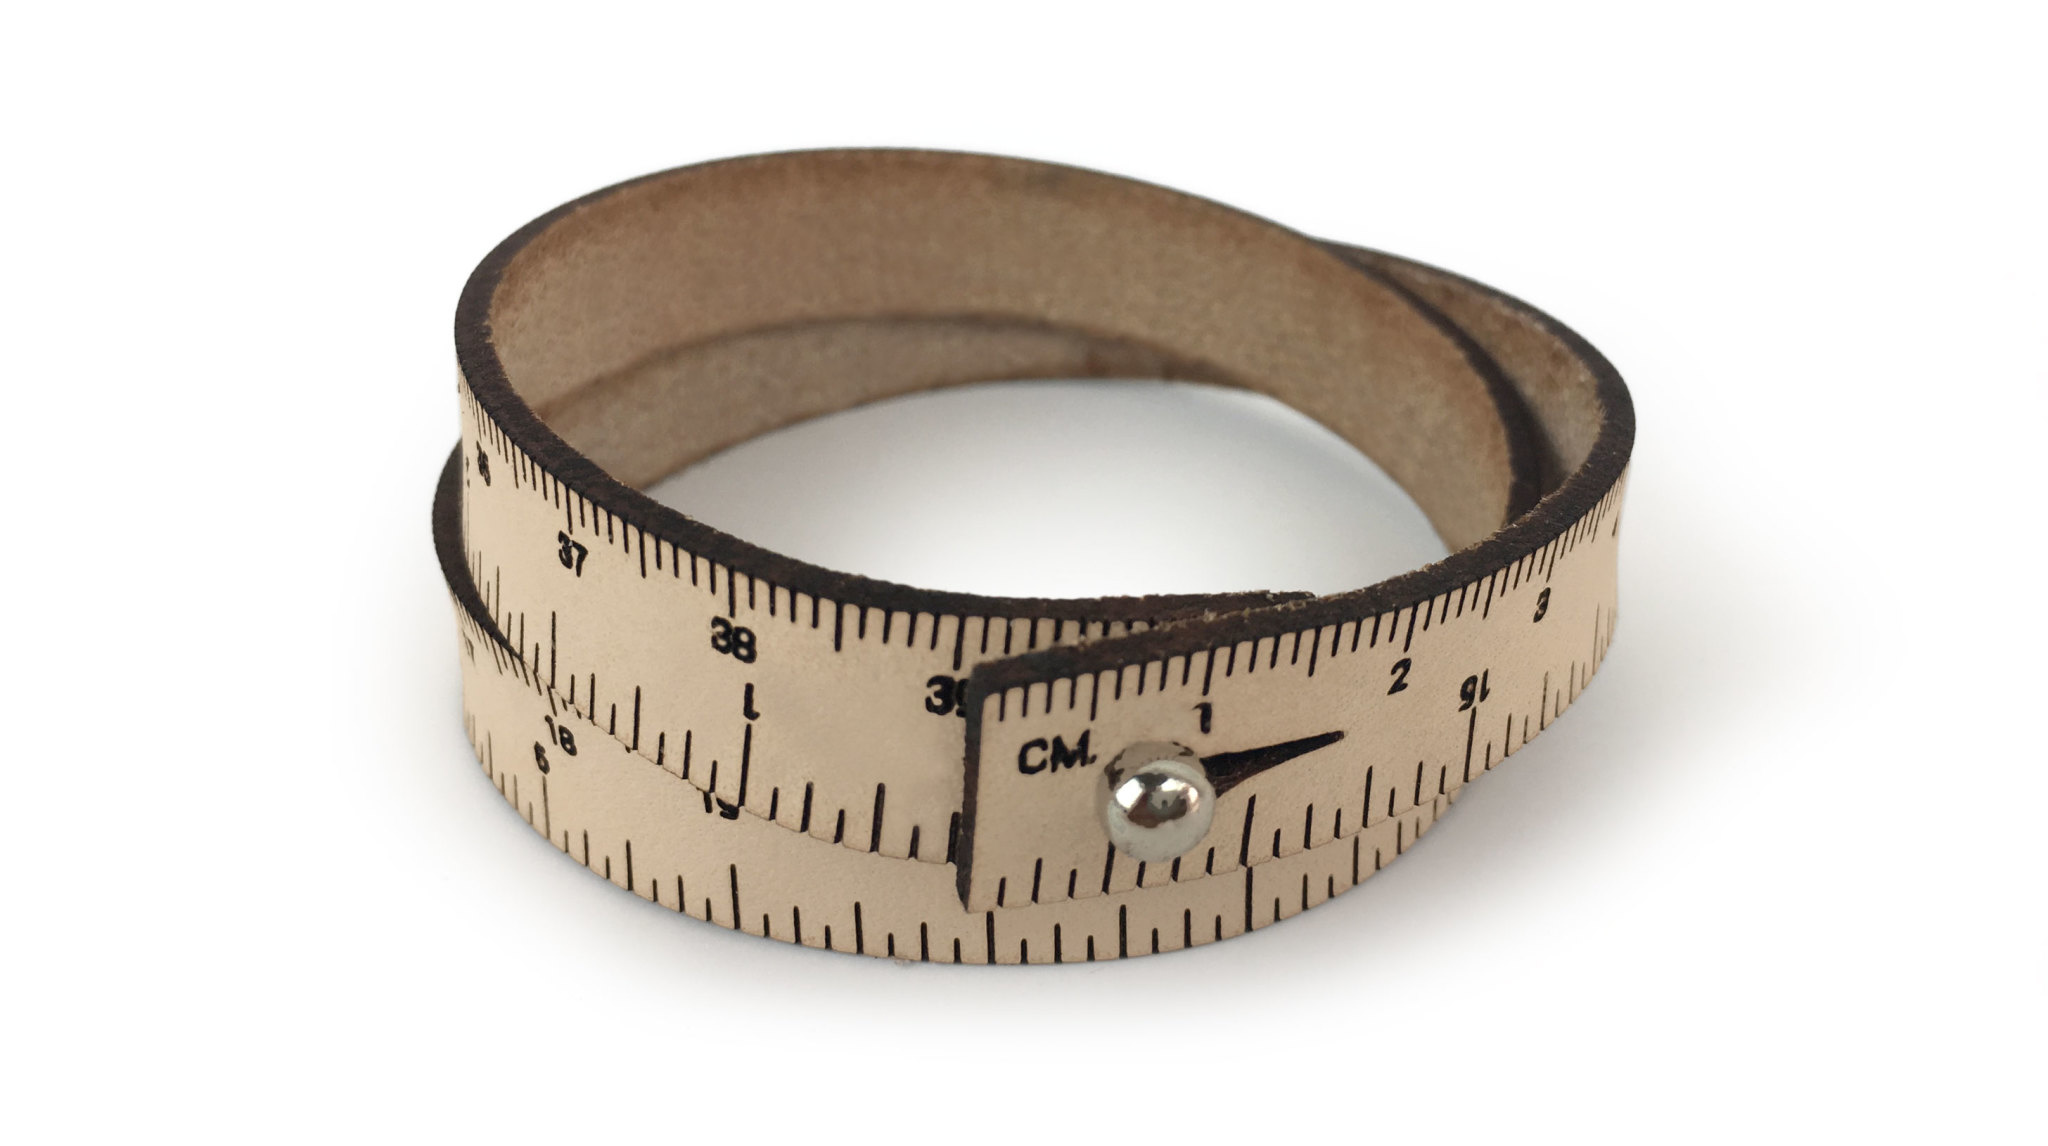 I Love Handles Wrist Ruler M17